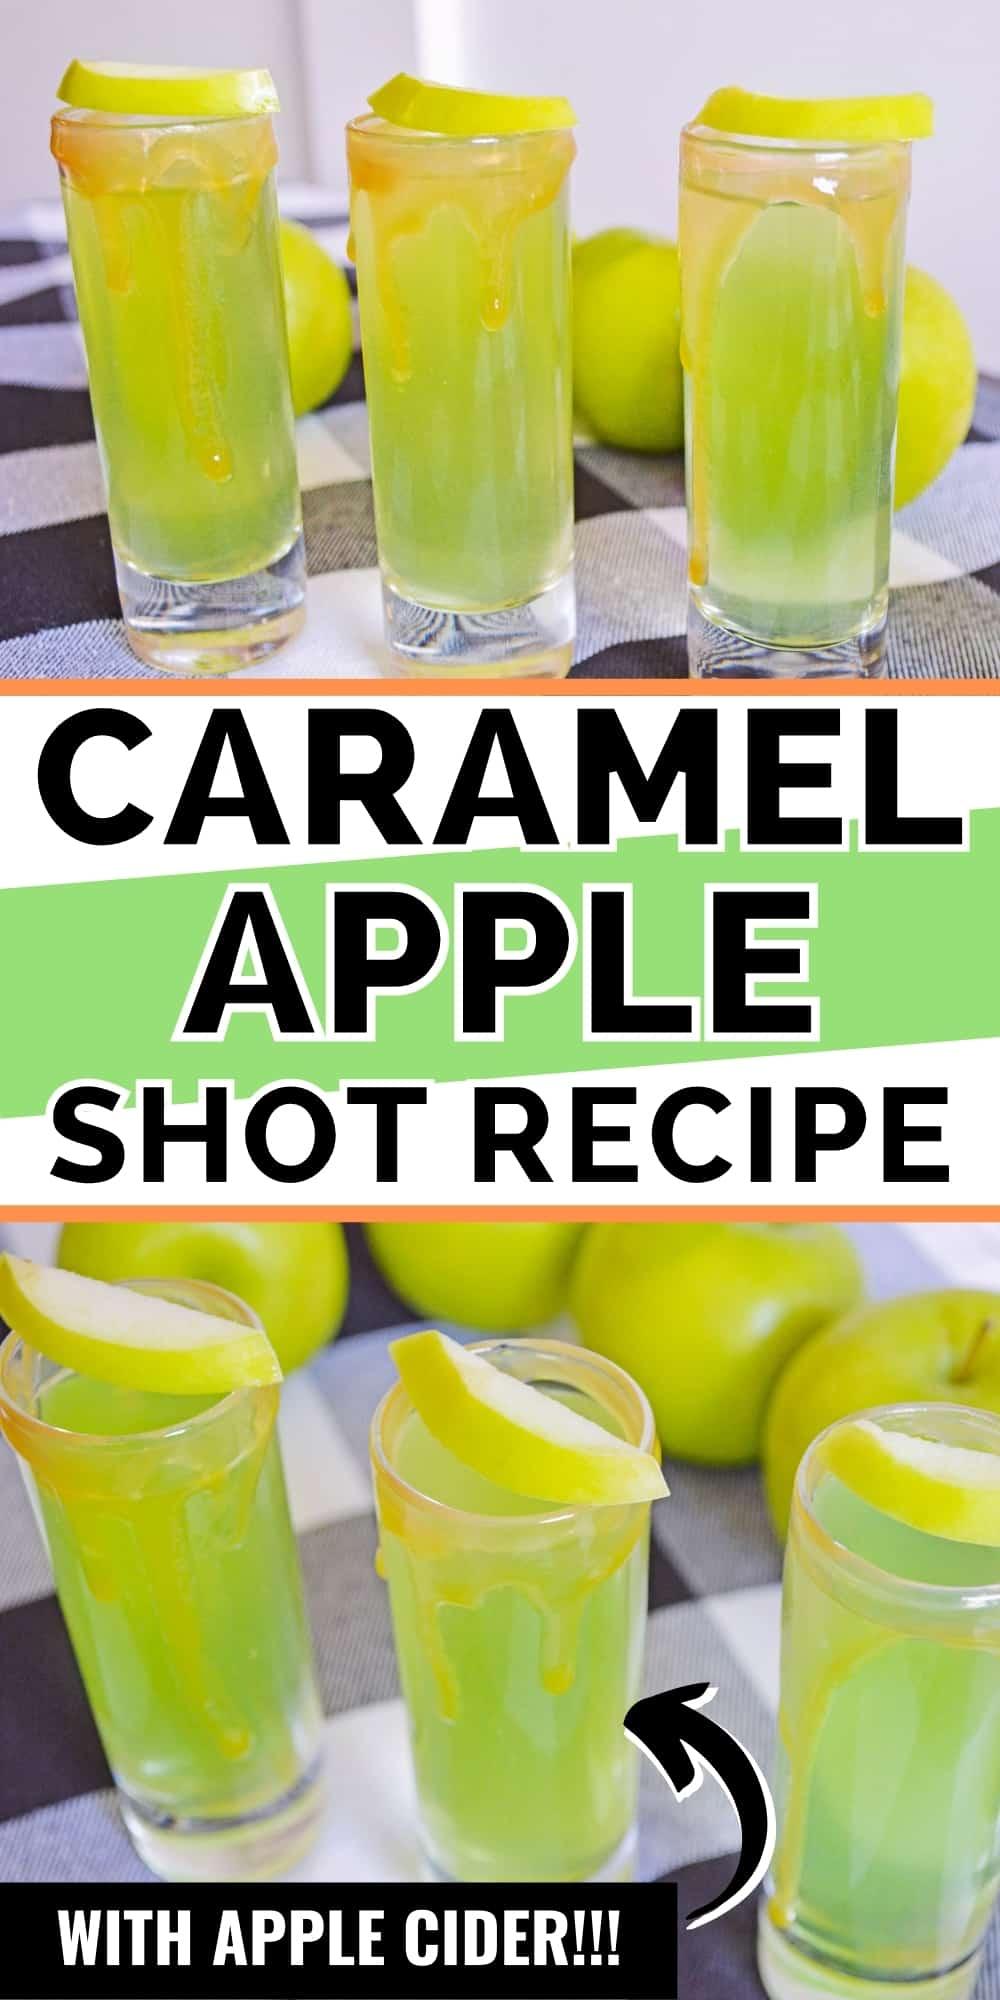 Pinterest image: Caramel Apple Shot Recipe, with apple cider